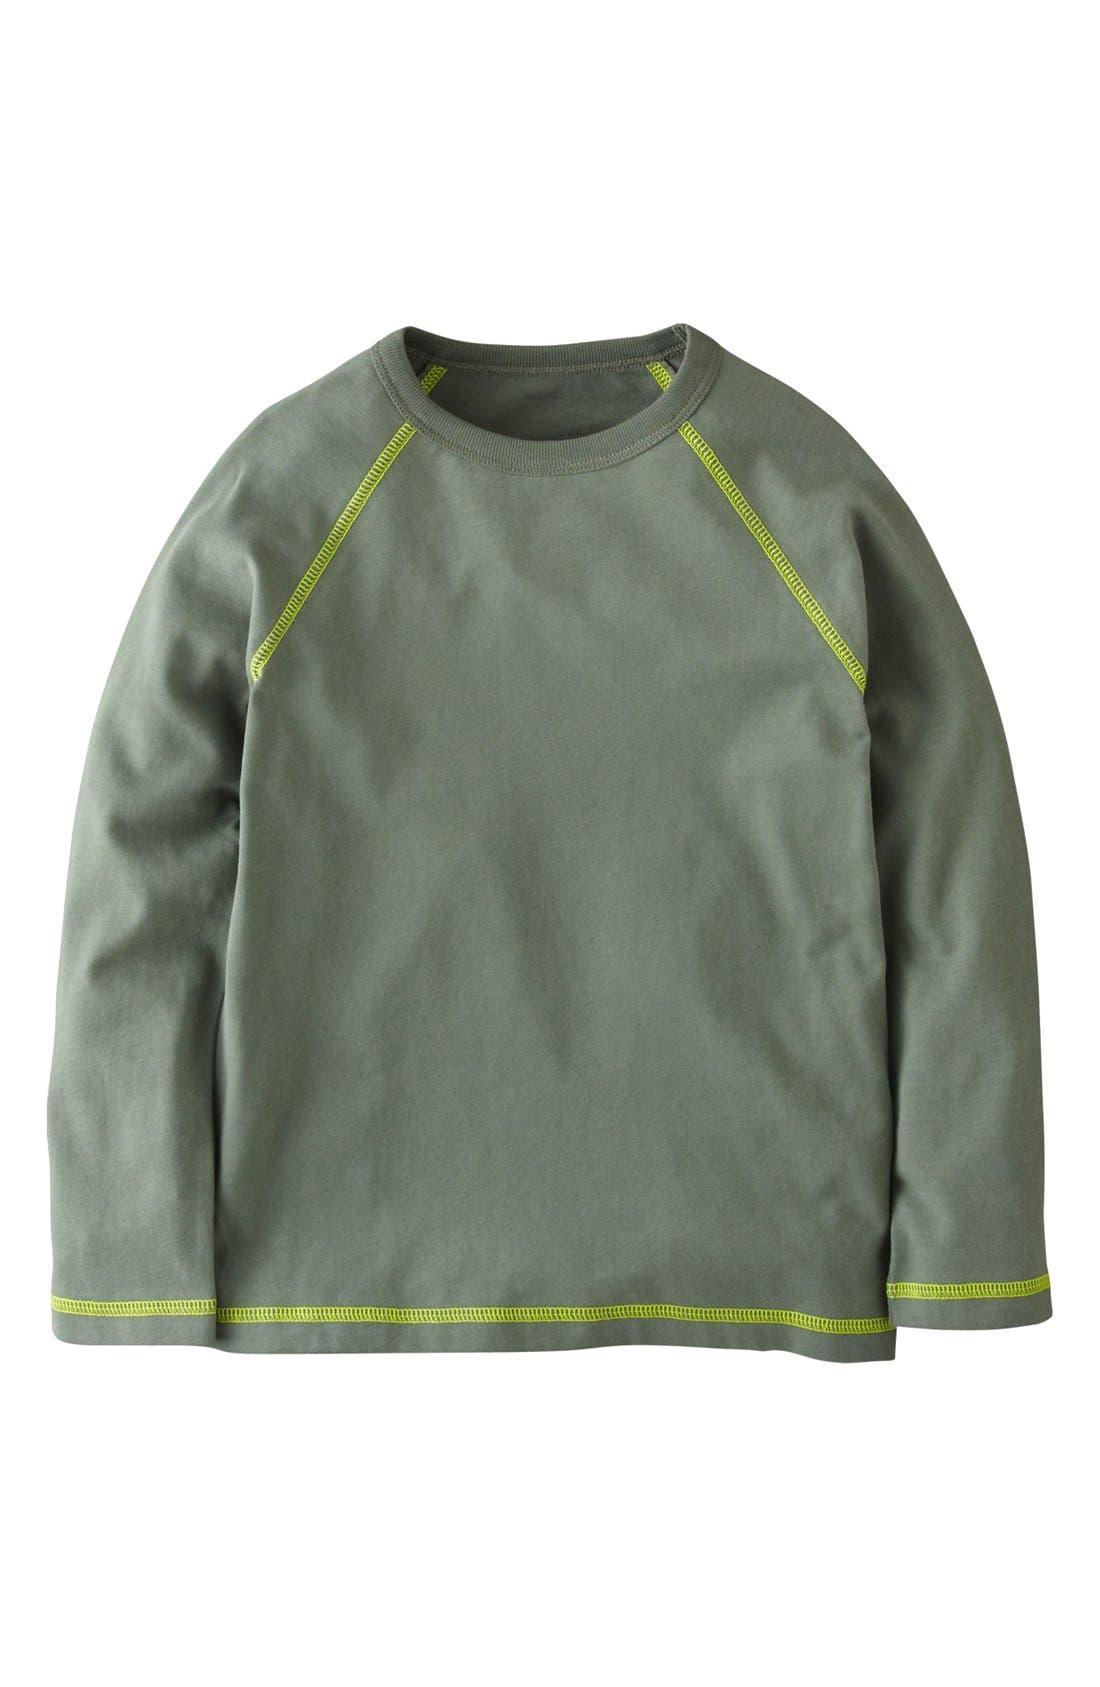 Main Image - Mini Boden Sueded Cotton T-Shirt (Toddler Boys, Little Boys & Big Boys)